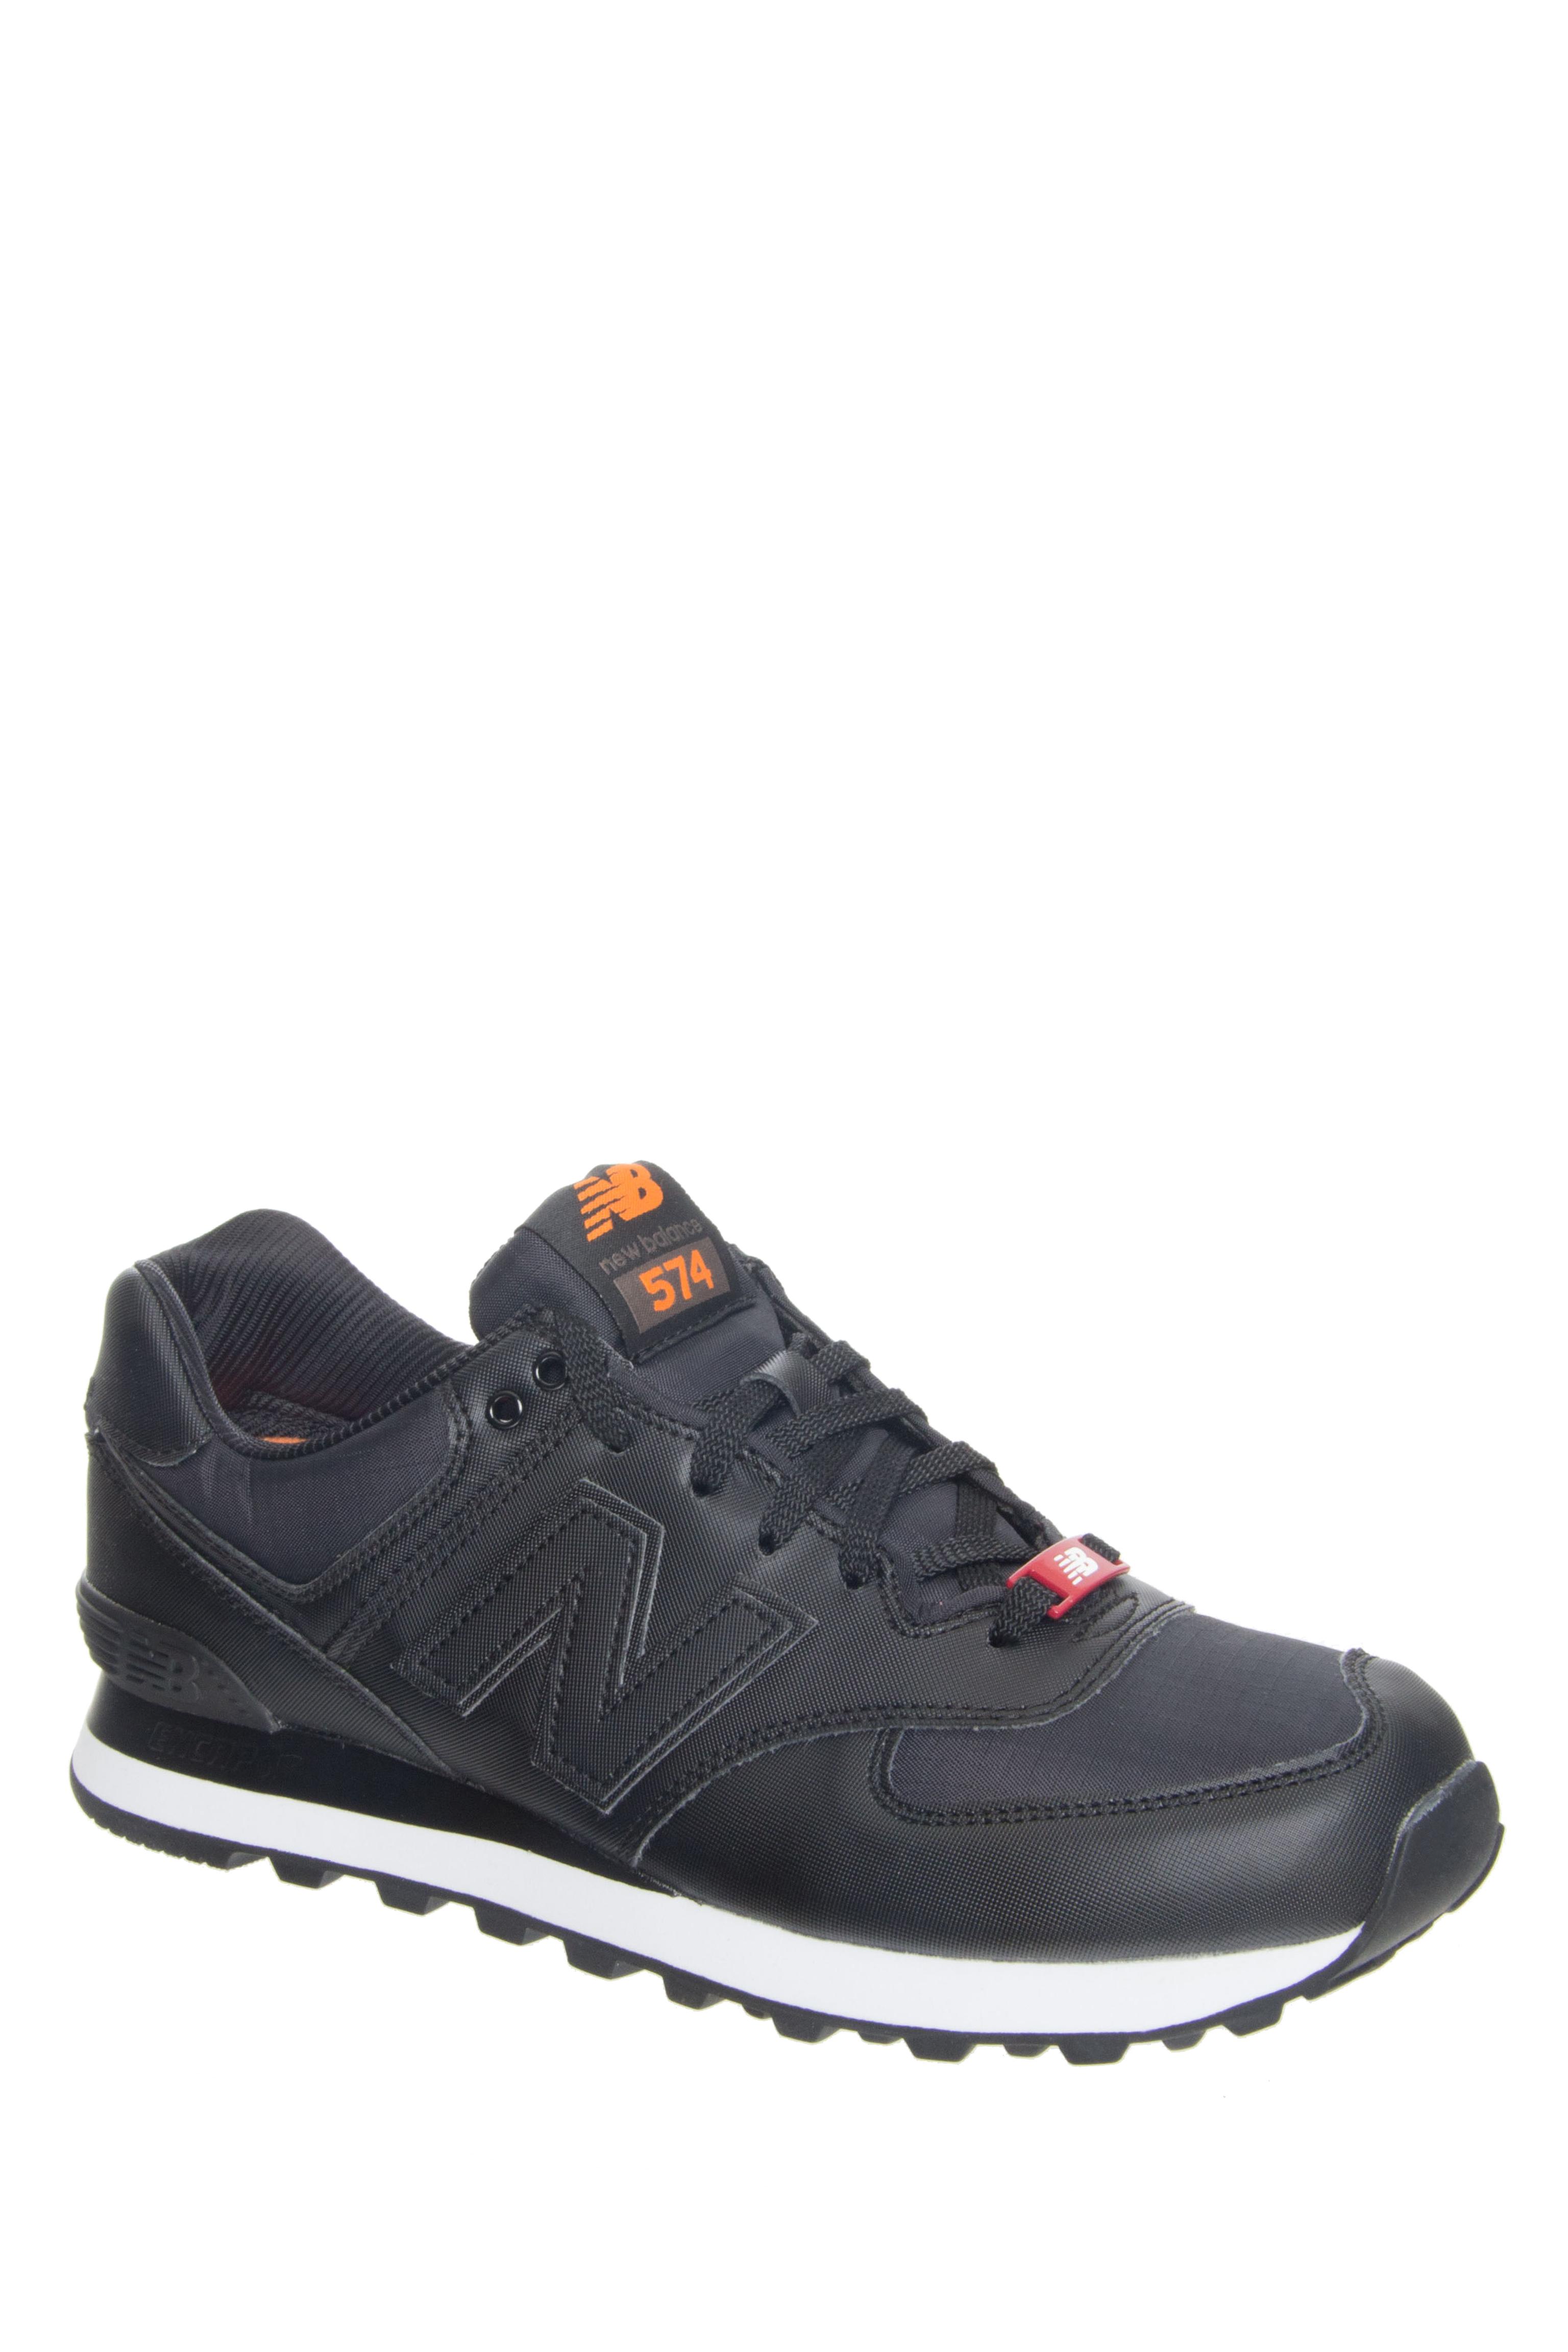 New Balance Men's 574 Flight Jacket Pack Low Top Sneaker - Black